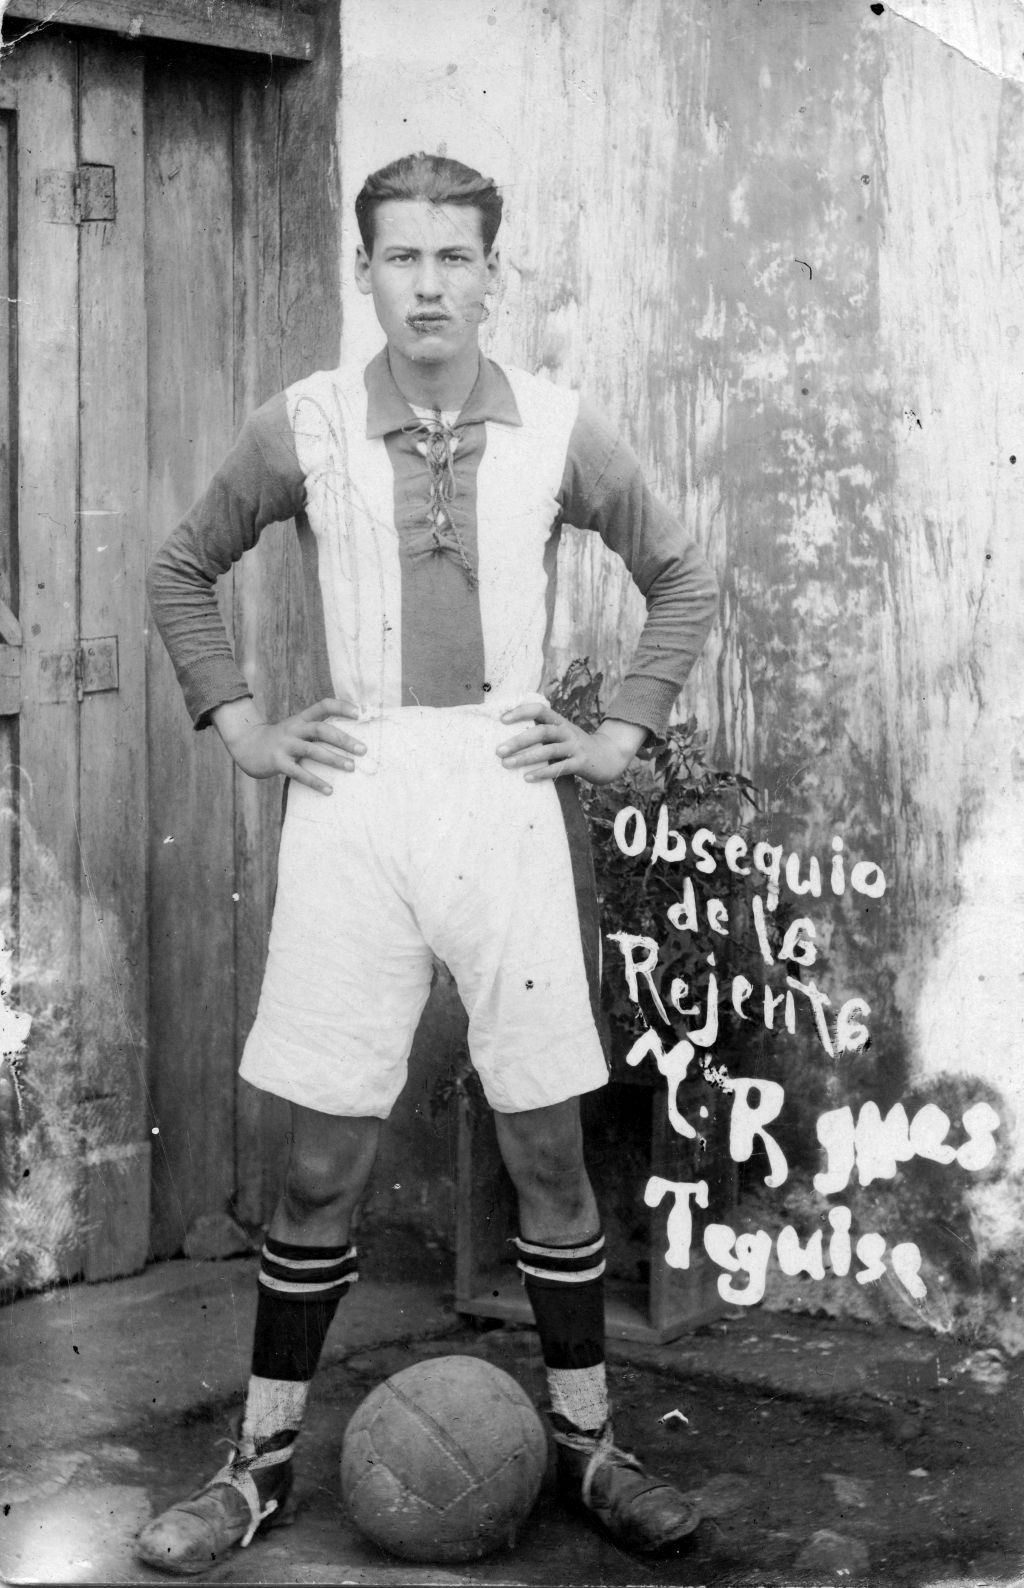 Futbolista de Teguise